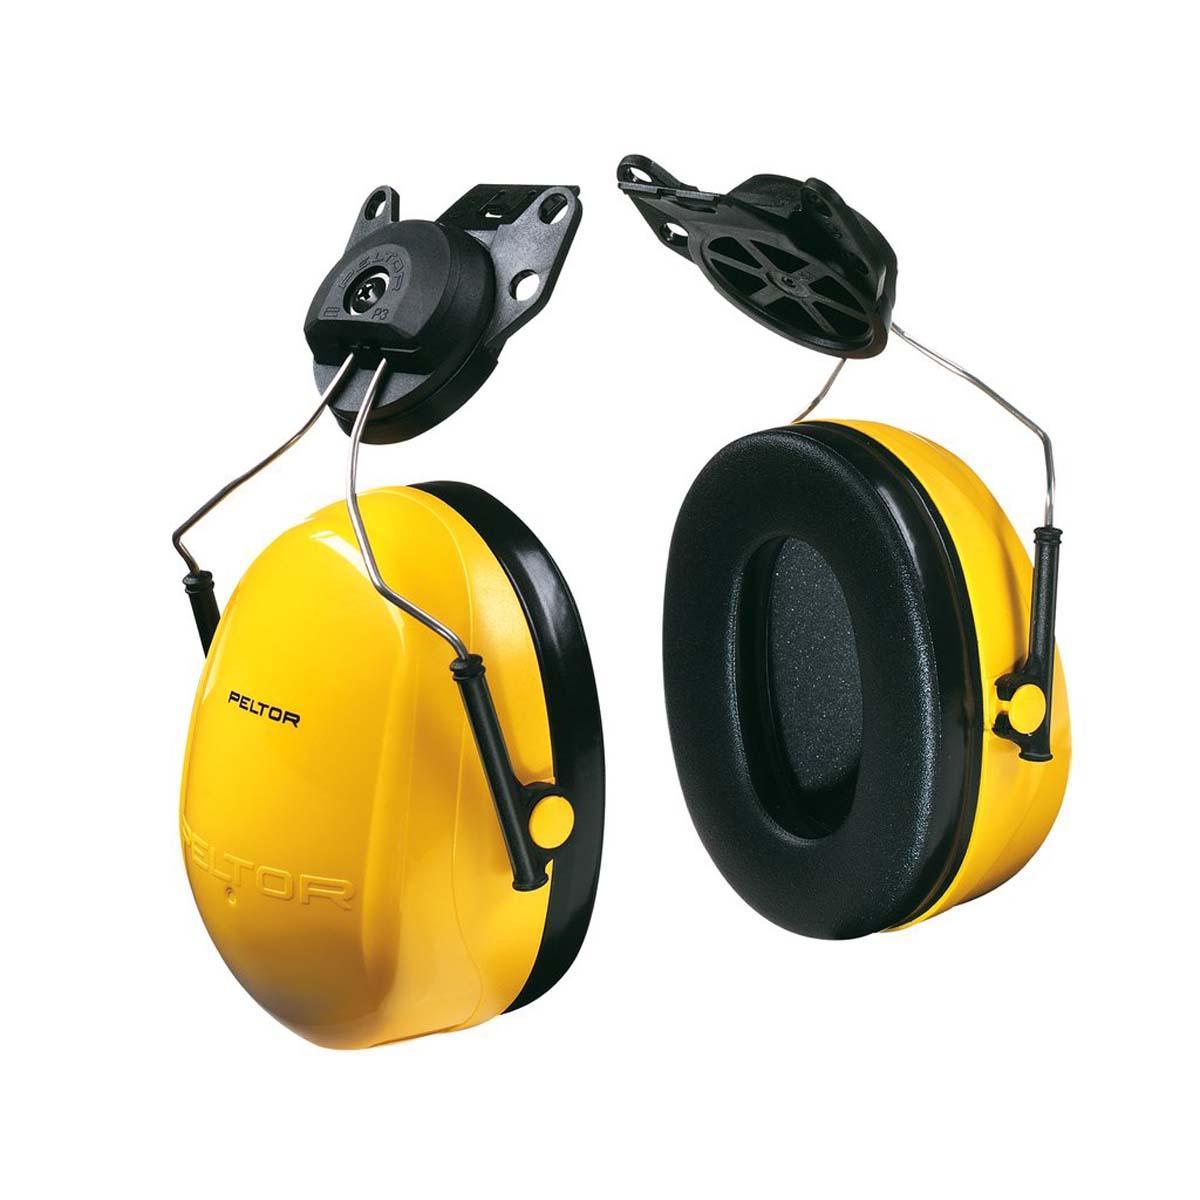 "3Mâ""¢ Peltorâ""¢ Optimeâ""¢ 98 Cap-Mount Earmuffs, Hearing Conservation H9P3E"